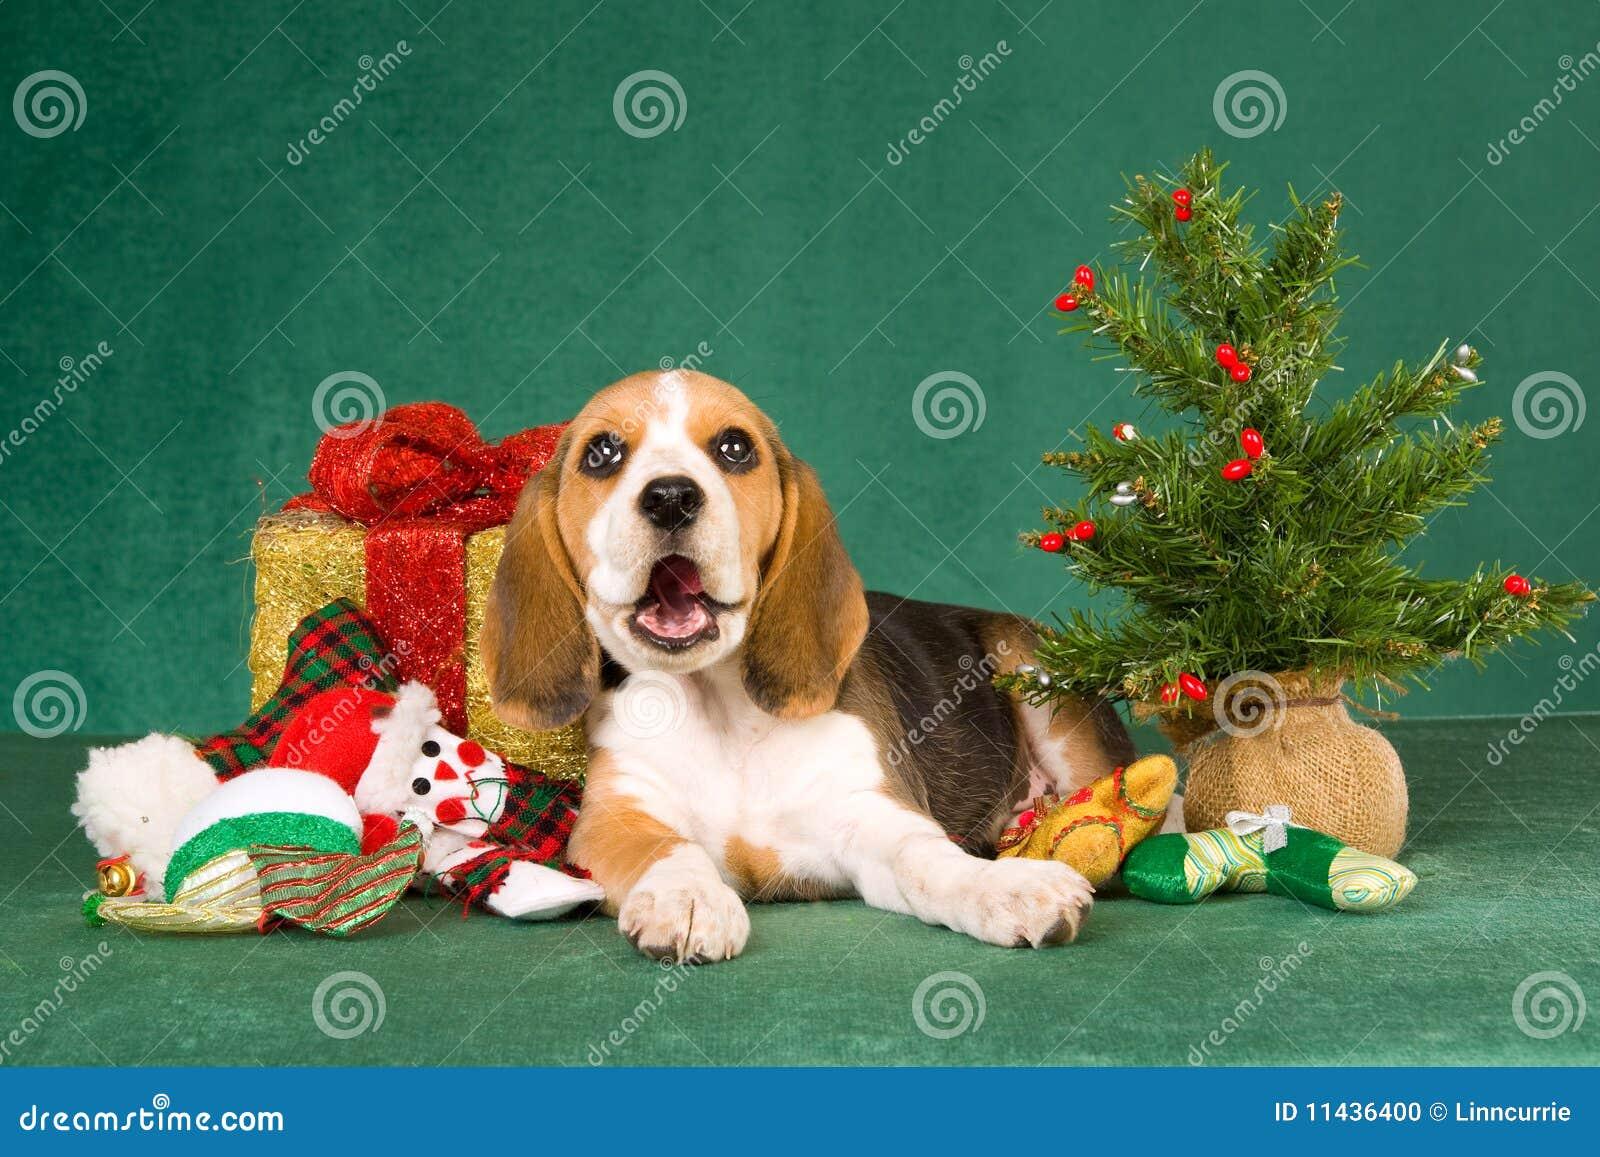 Funny Beagle Puppy With Chrismas Tree Stock Photo - Image: 11436400